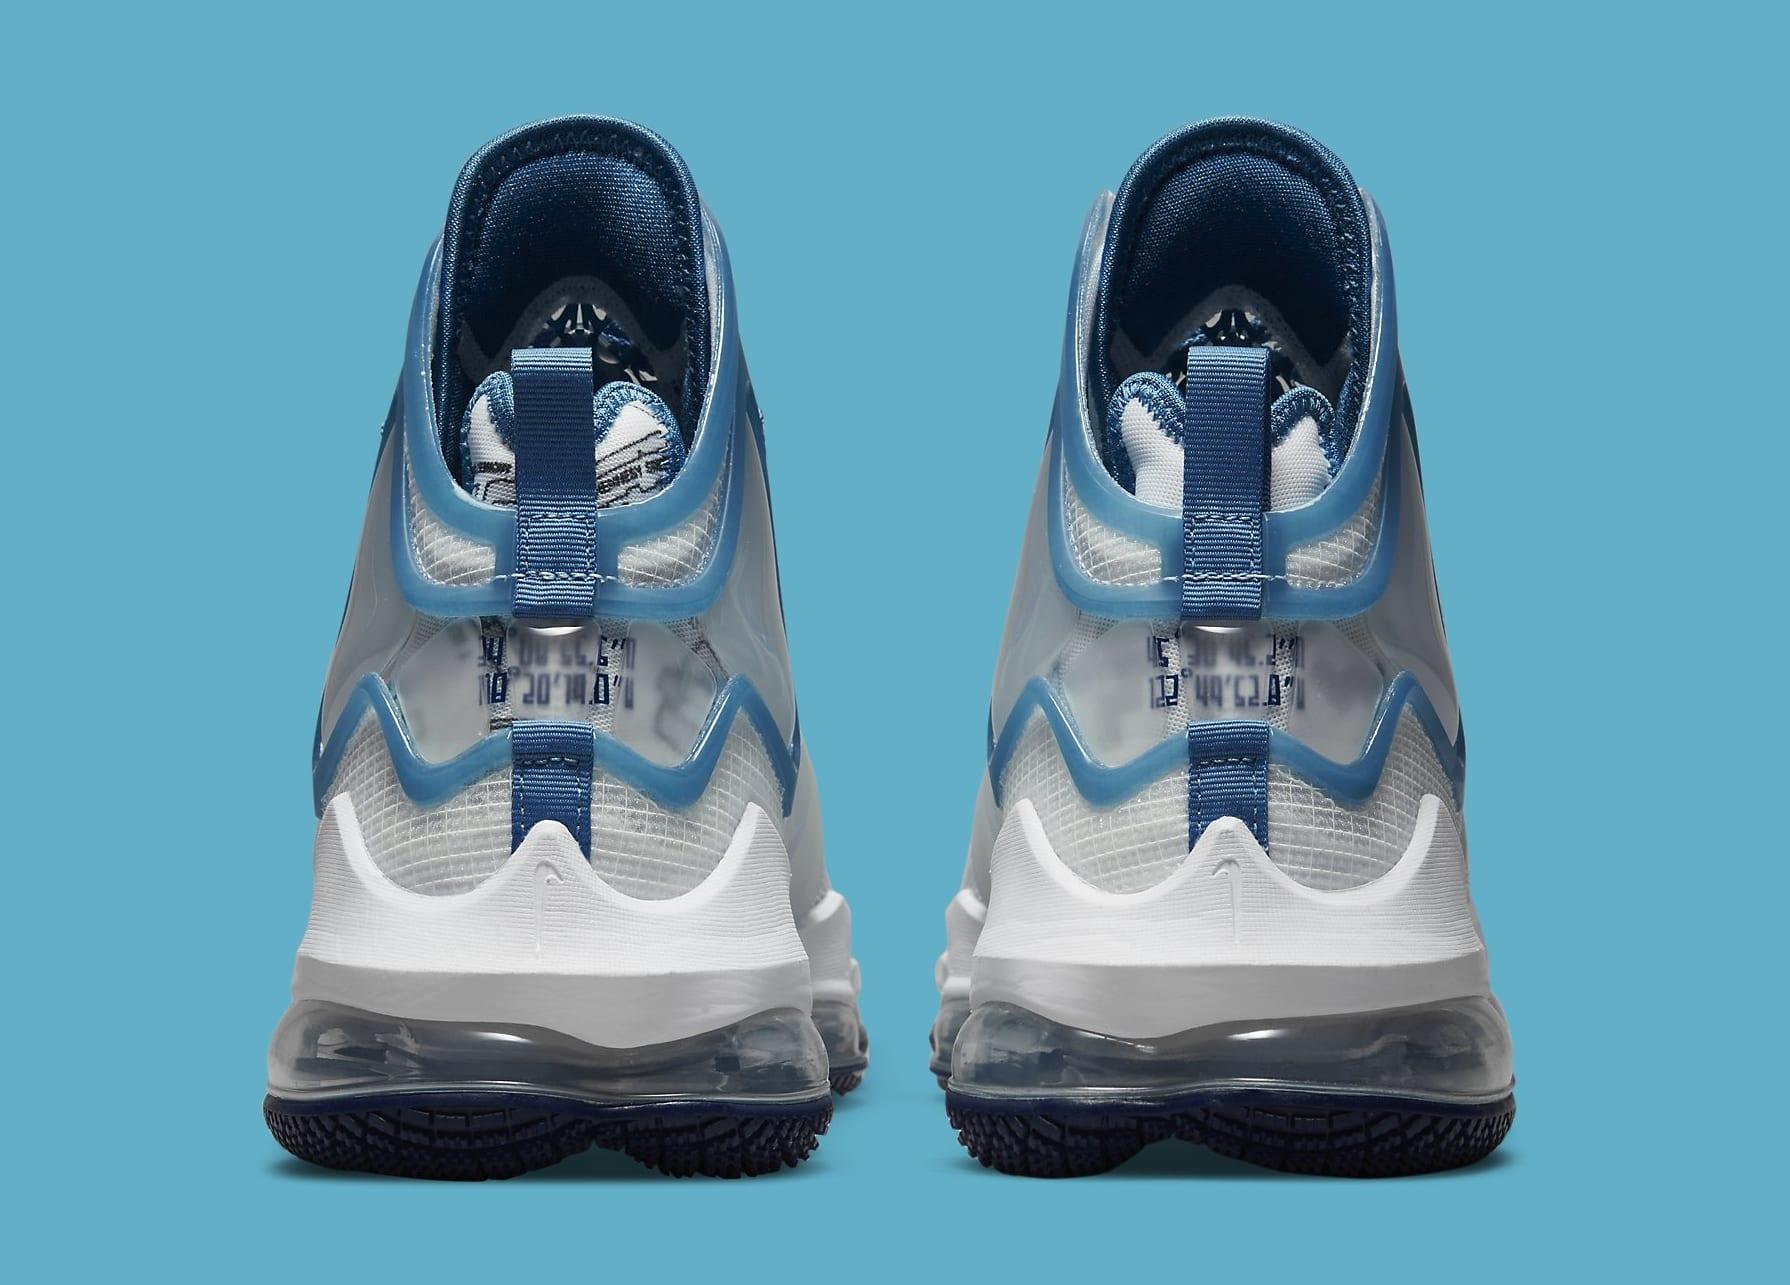 Nike LeBron 19 'Space Jam' DC9338-100 Heel